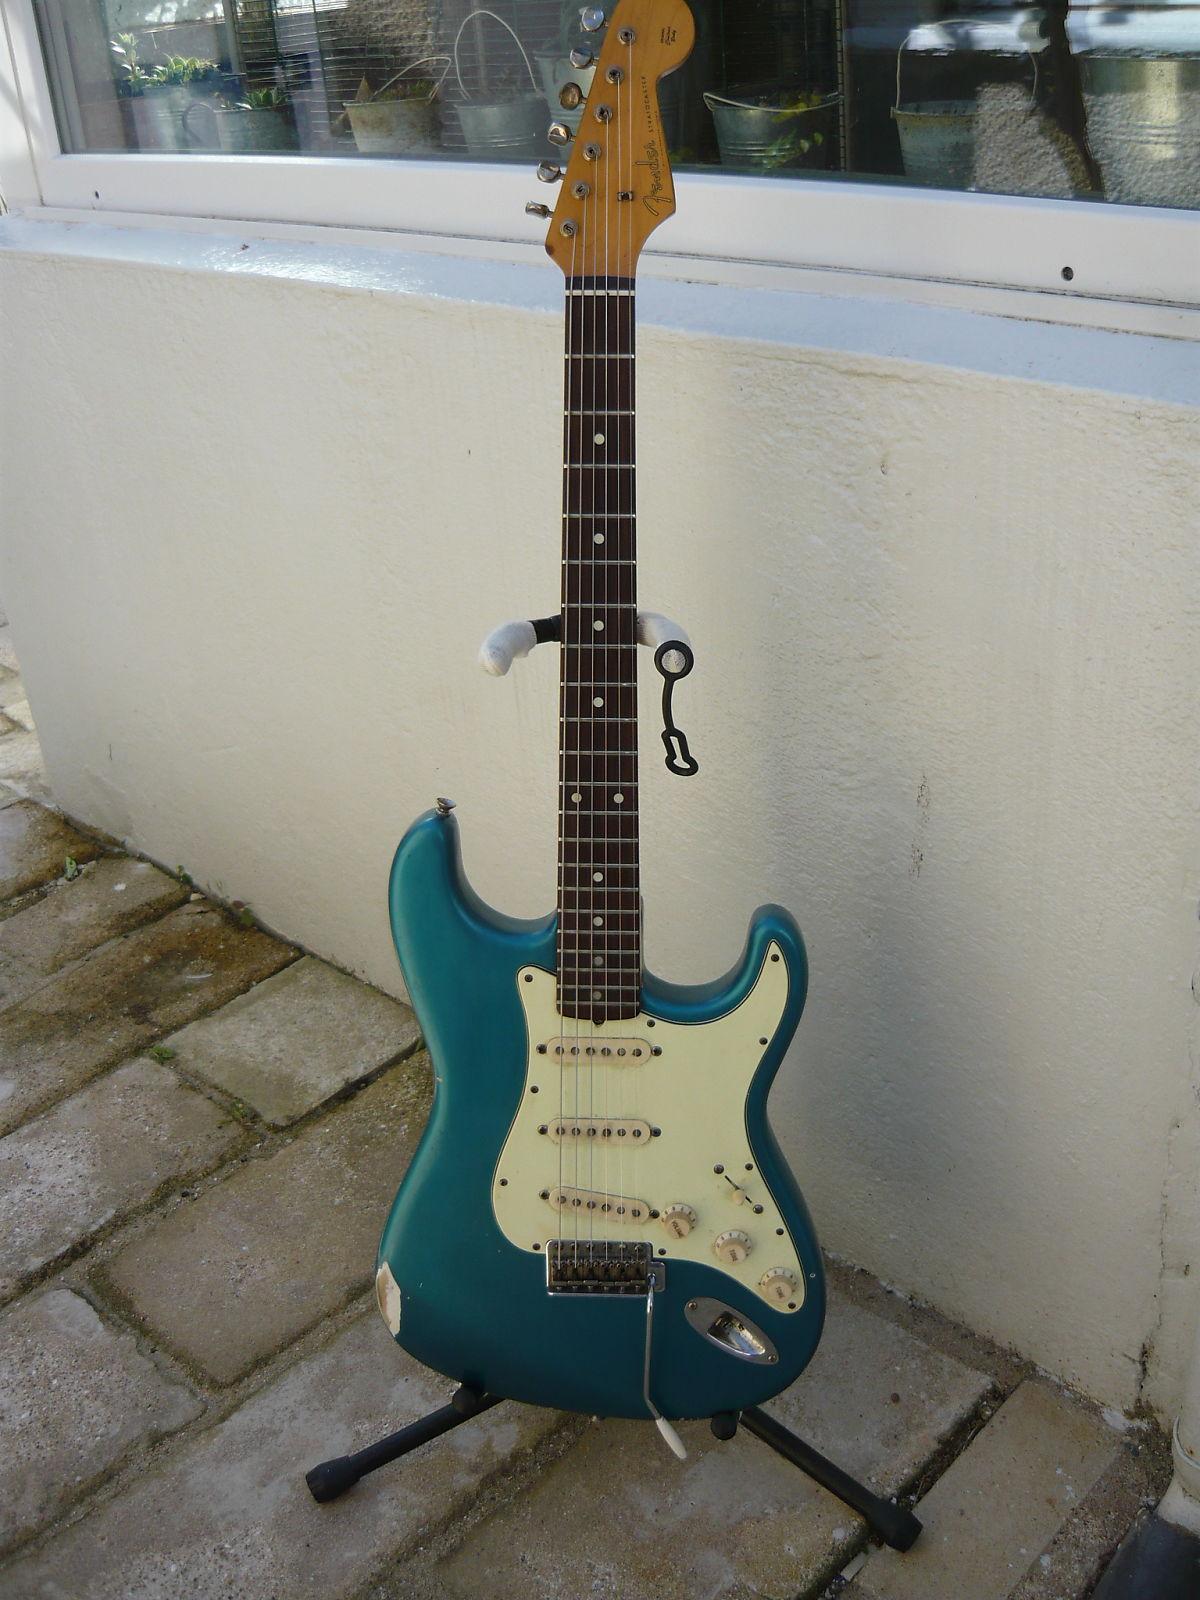 Fake 1961 Stratocaster